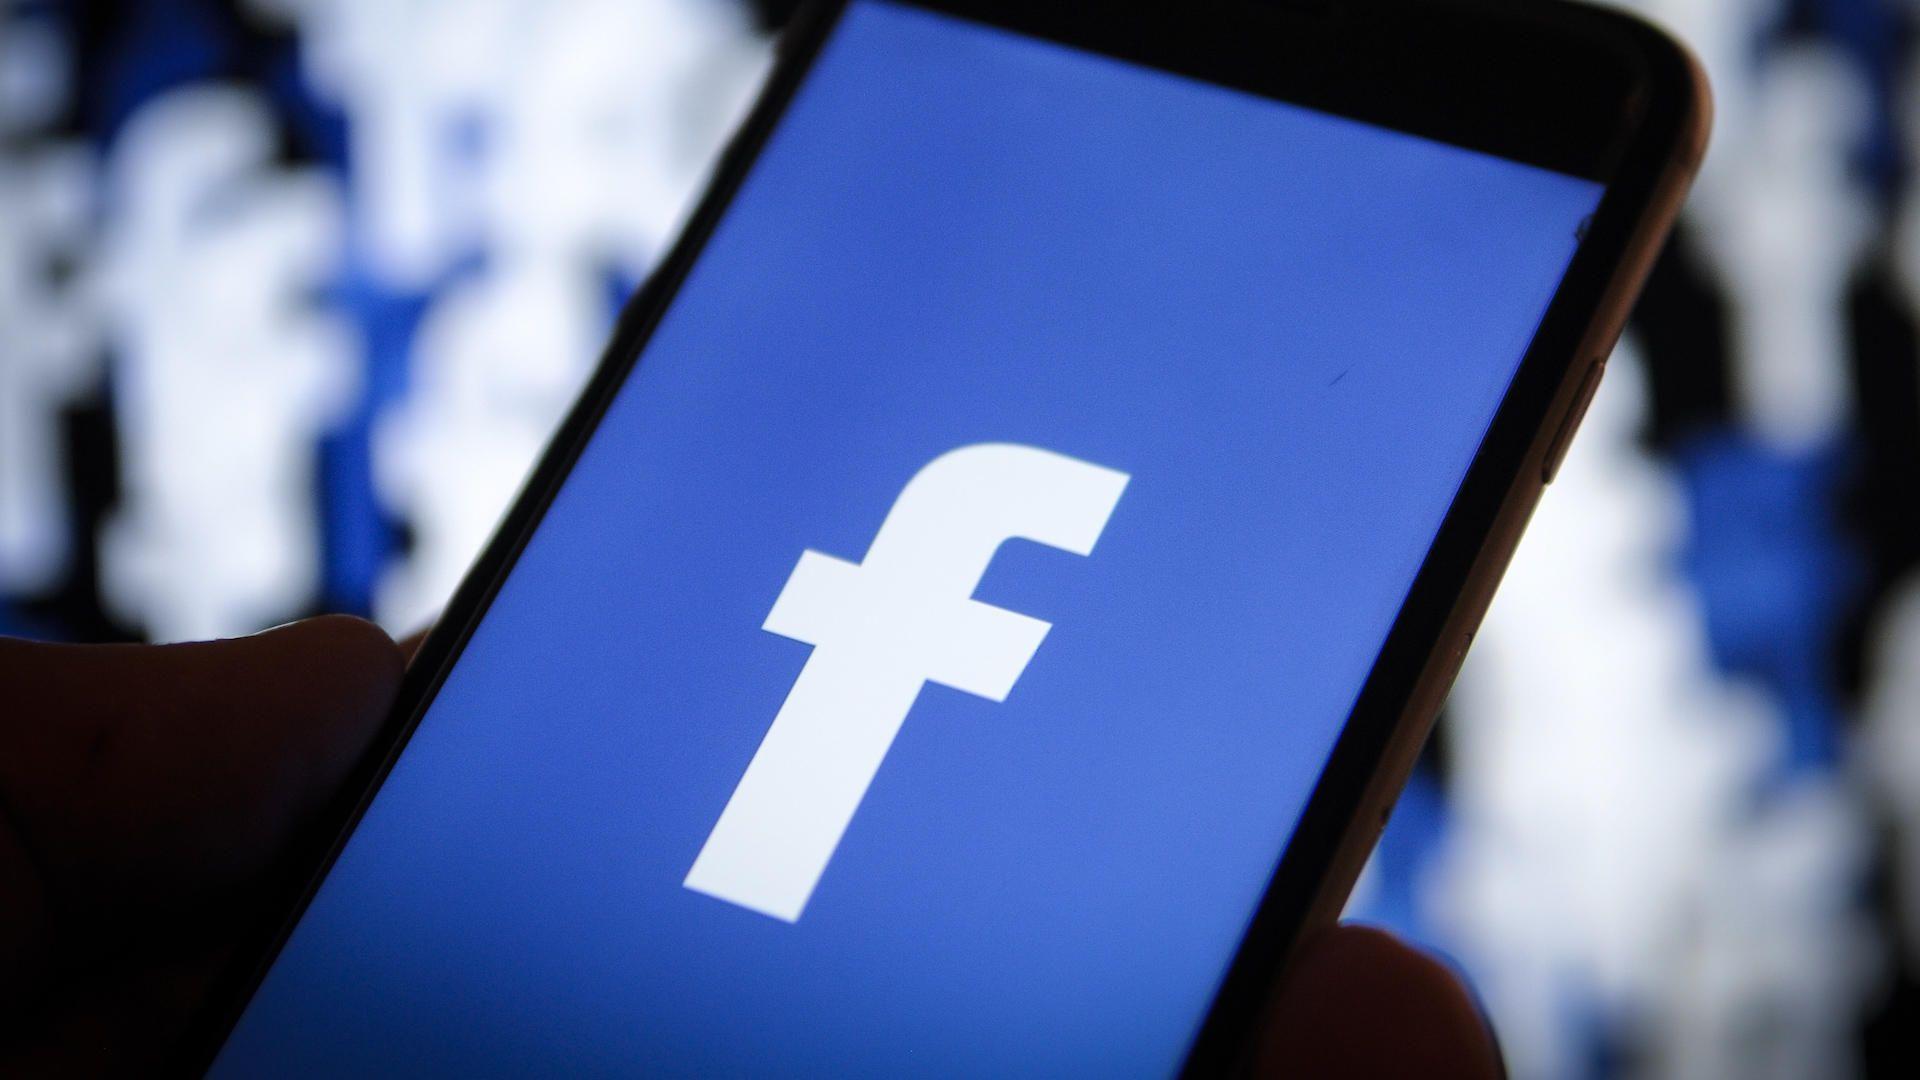 Como Alterar O Nome Da Minha Pagina No Facebook